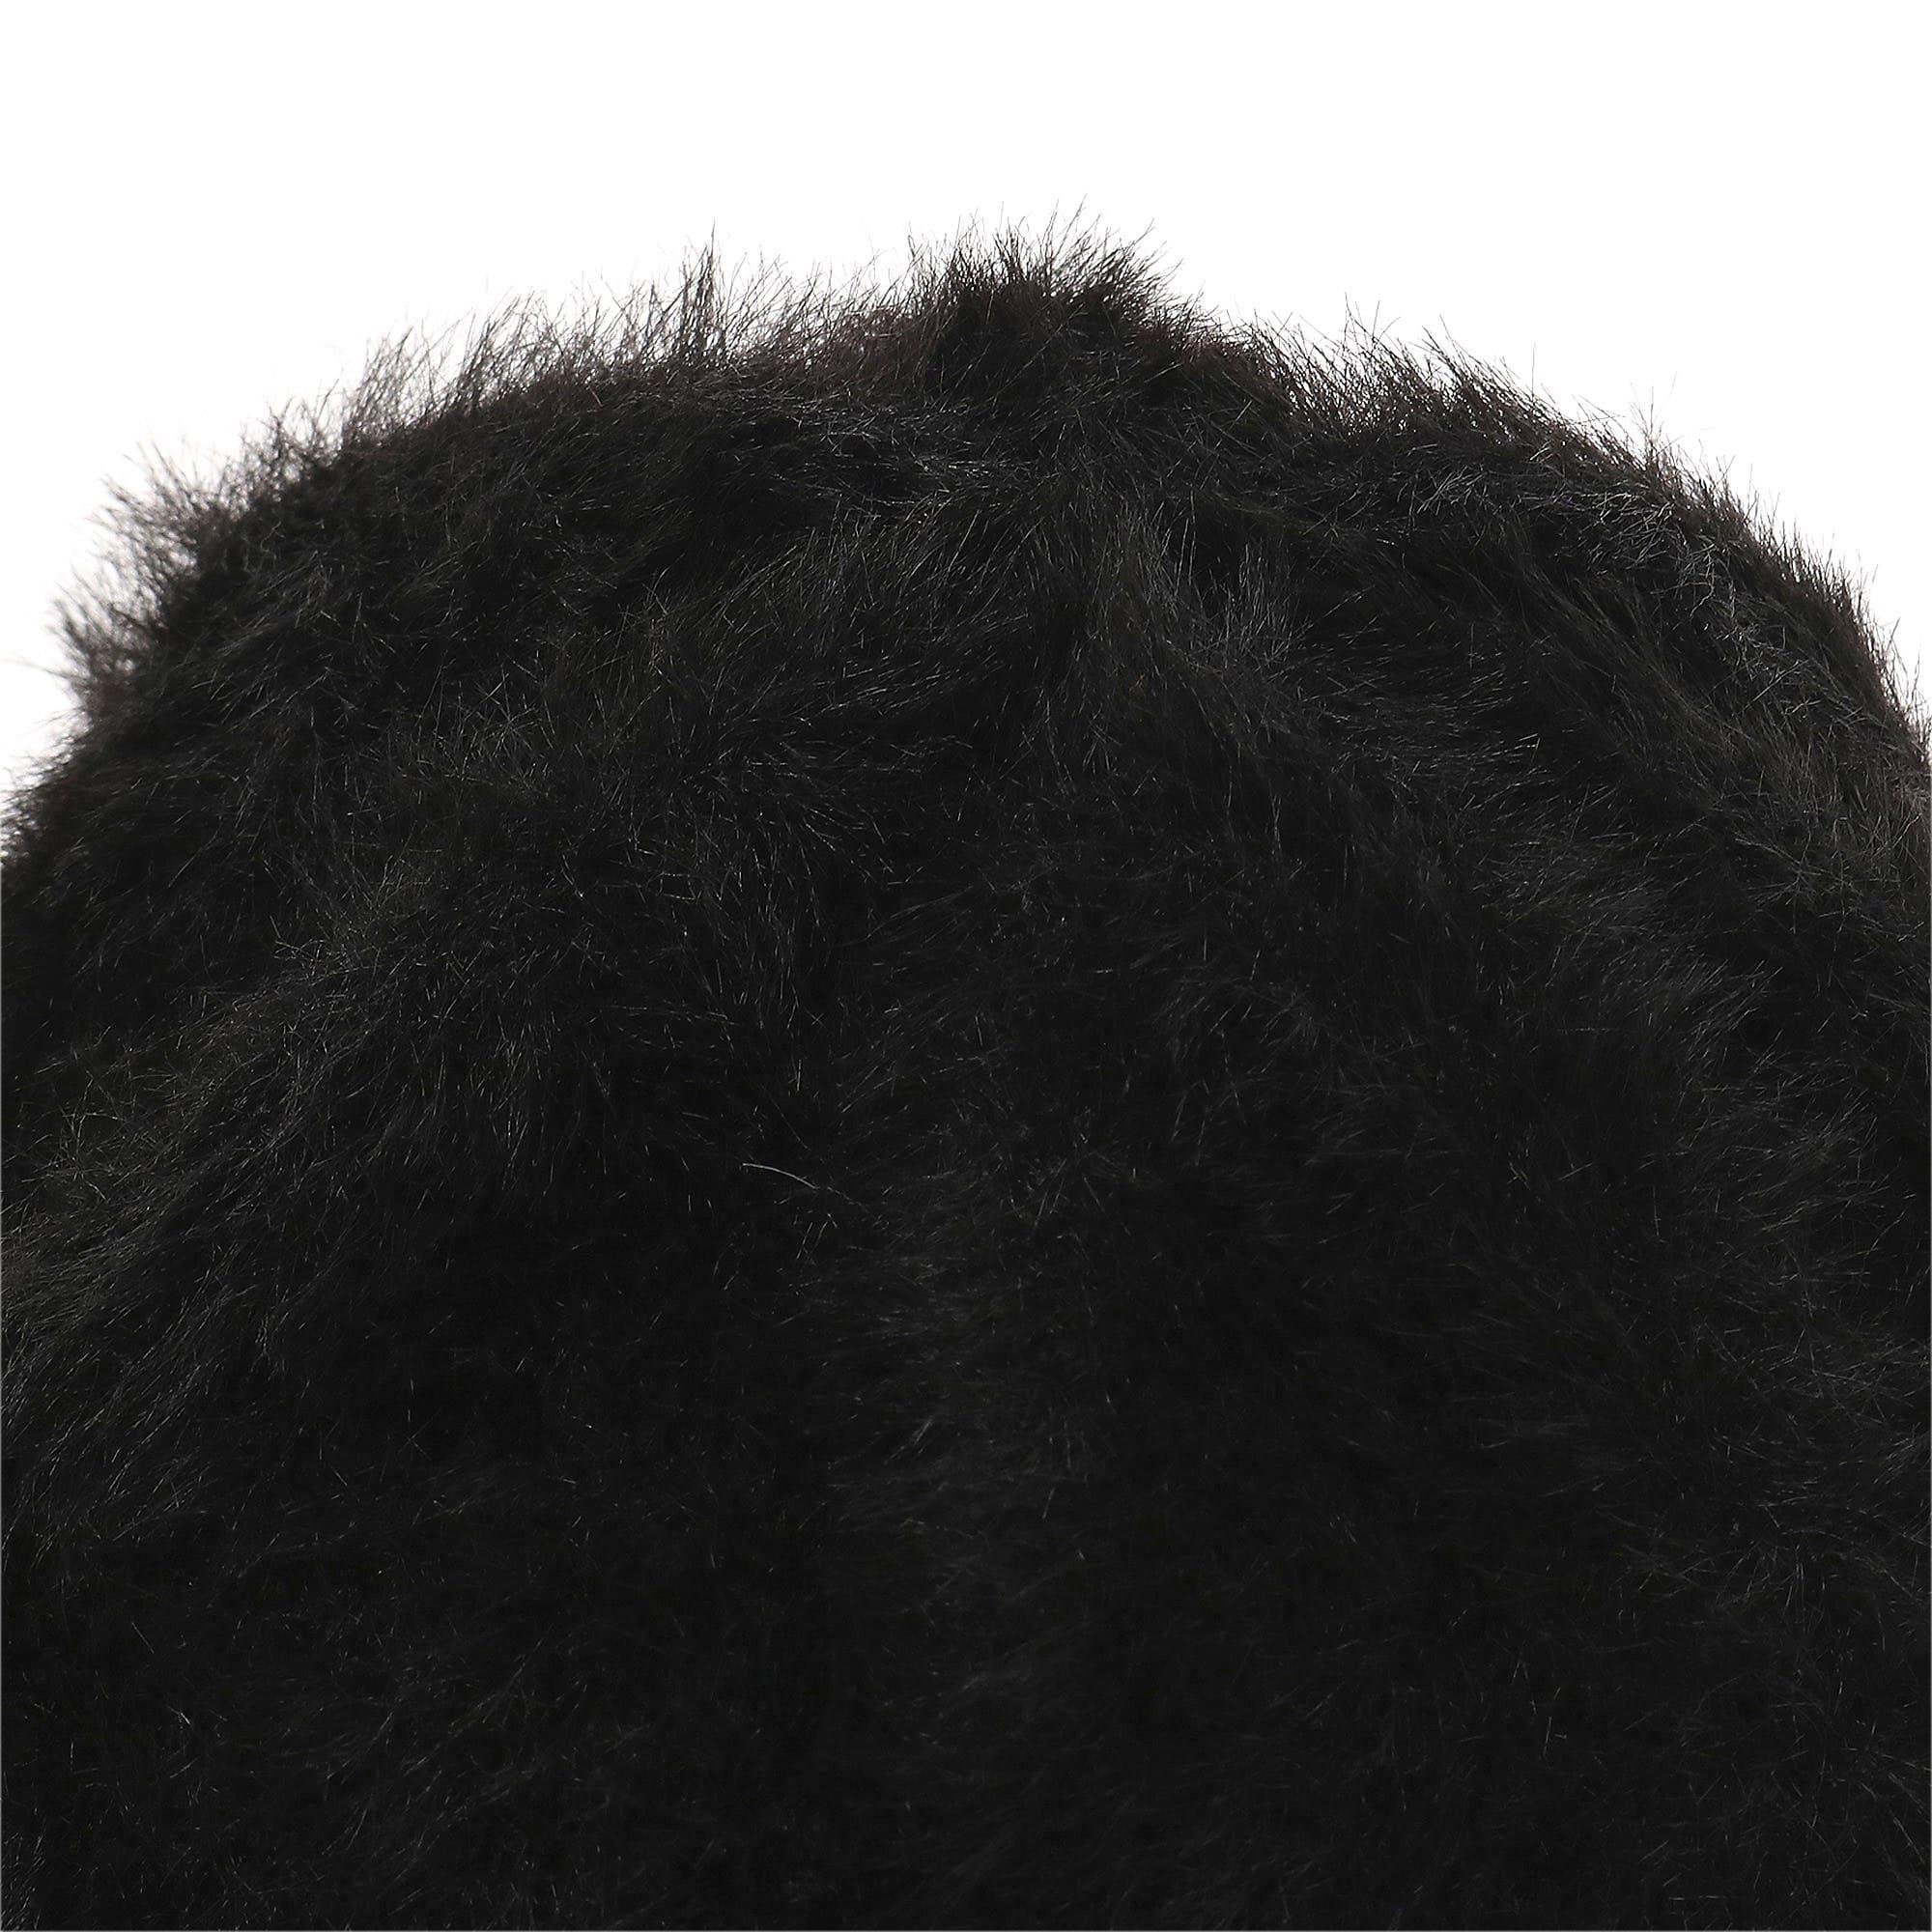 Thumbnail 4 of ゴルフ ウィメンズ ブリム ビーニー, Puma Black, medium-JPN